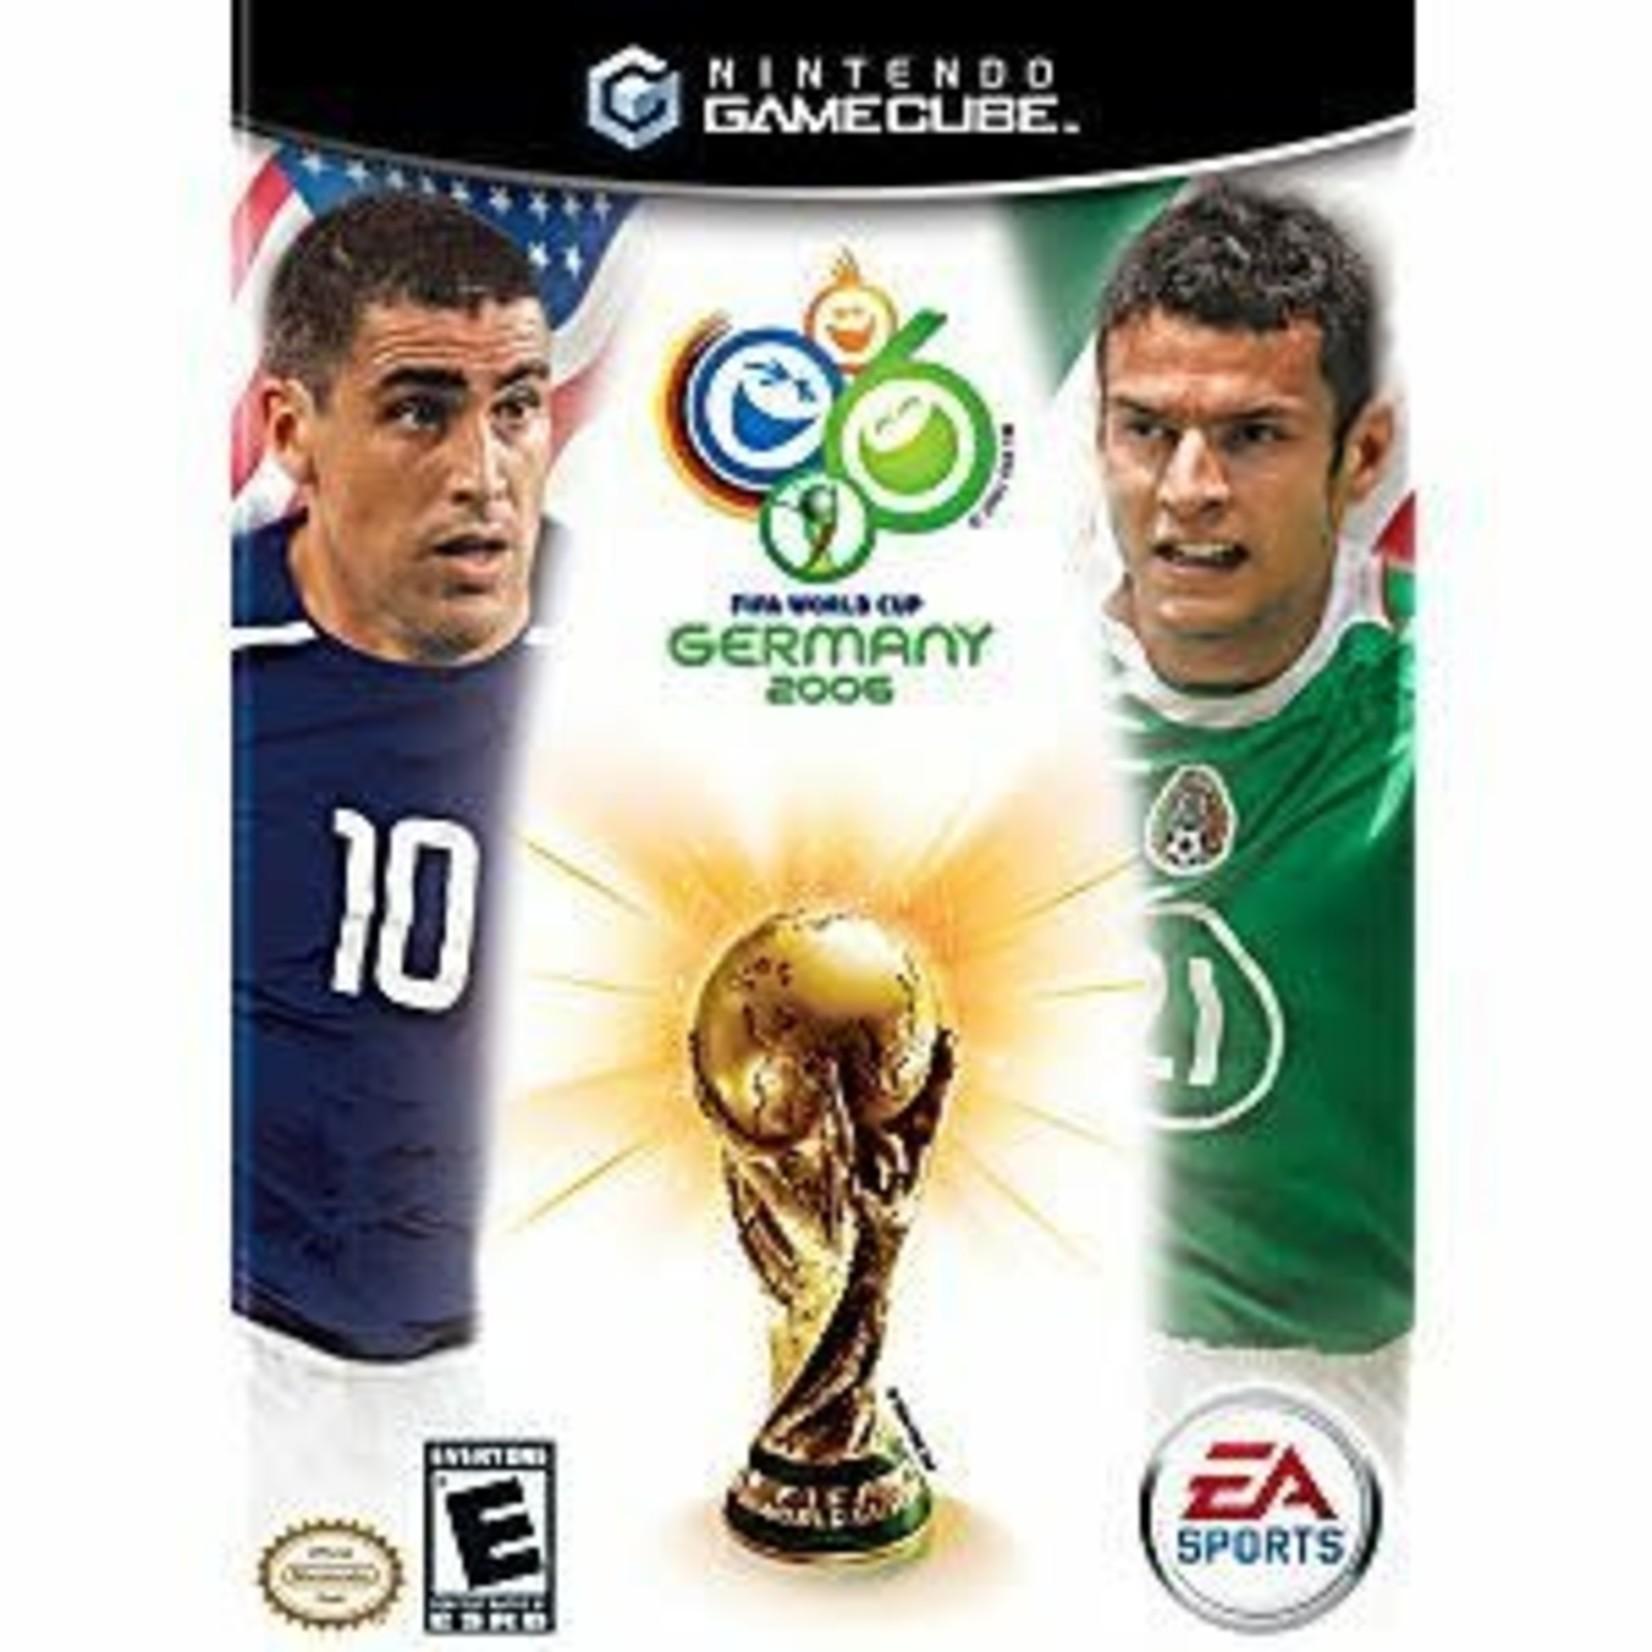 GCU-FIFA World Cup 2006 Germany